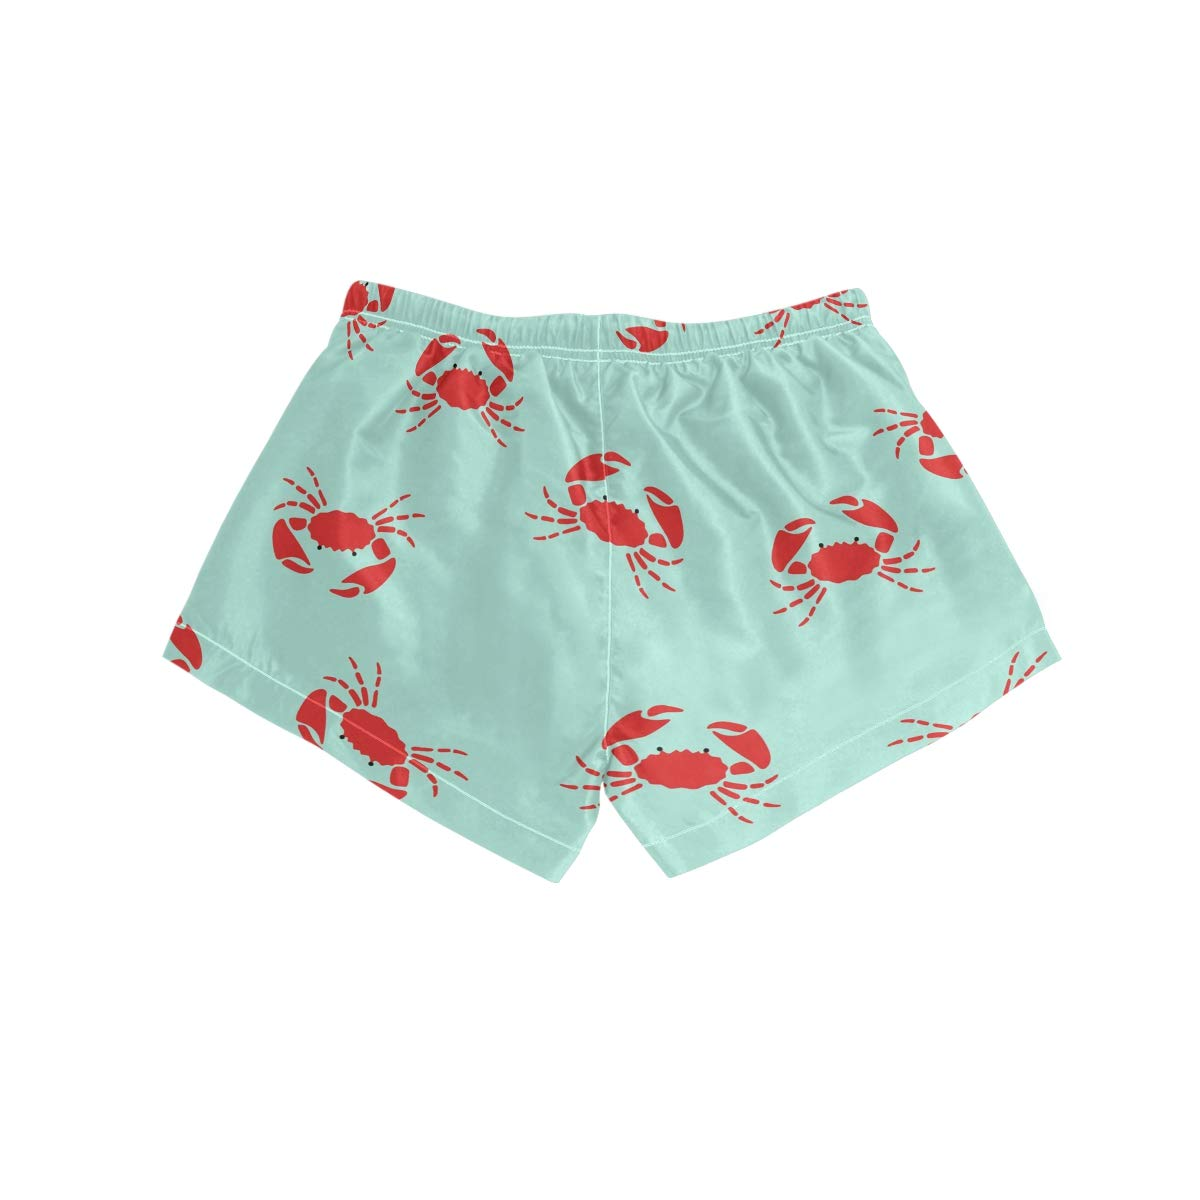 Women Swim Trunks Red Crabs On Blue Background Beach Board Shorts